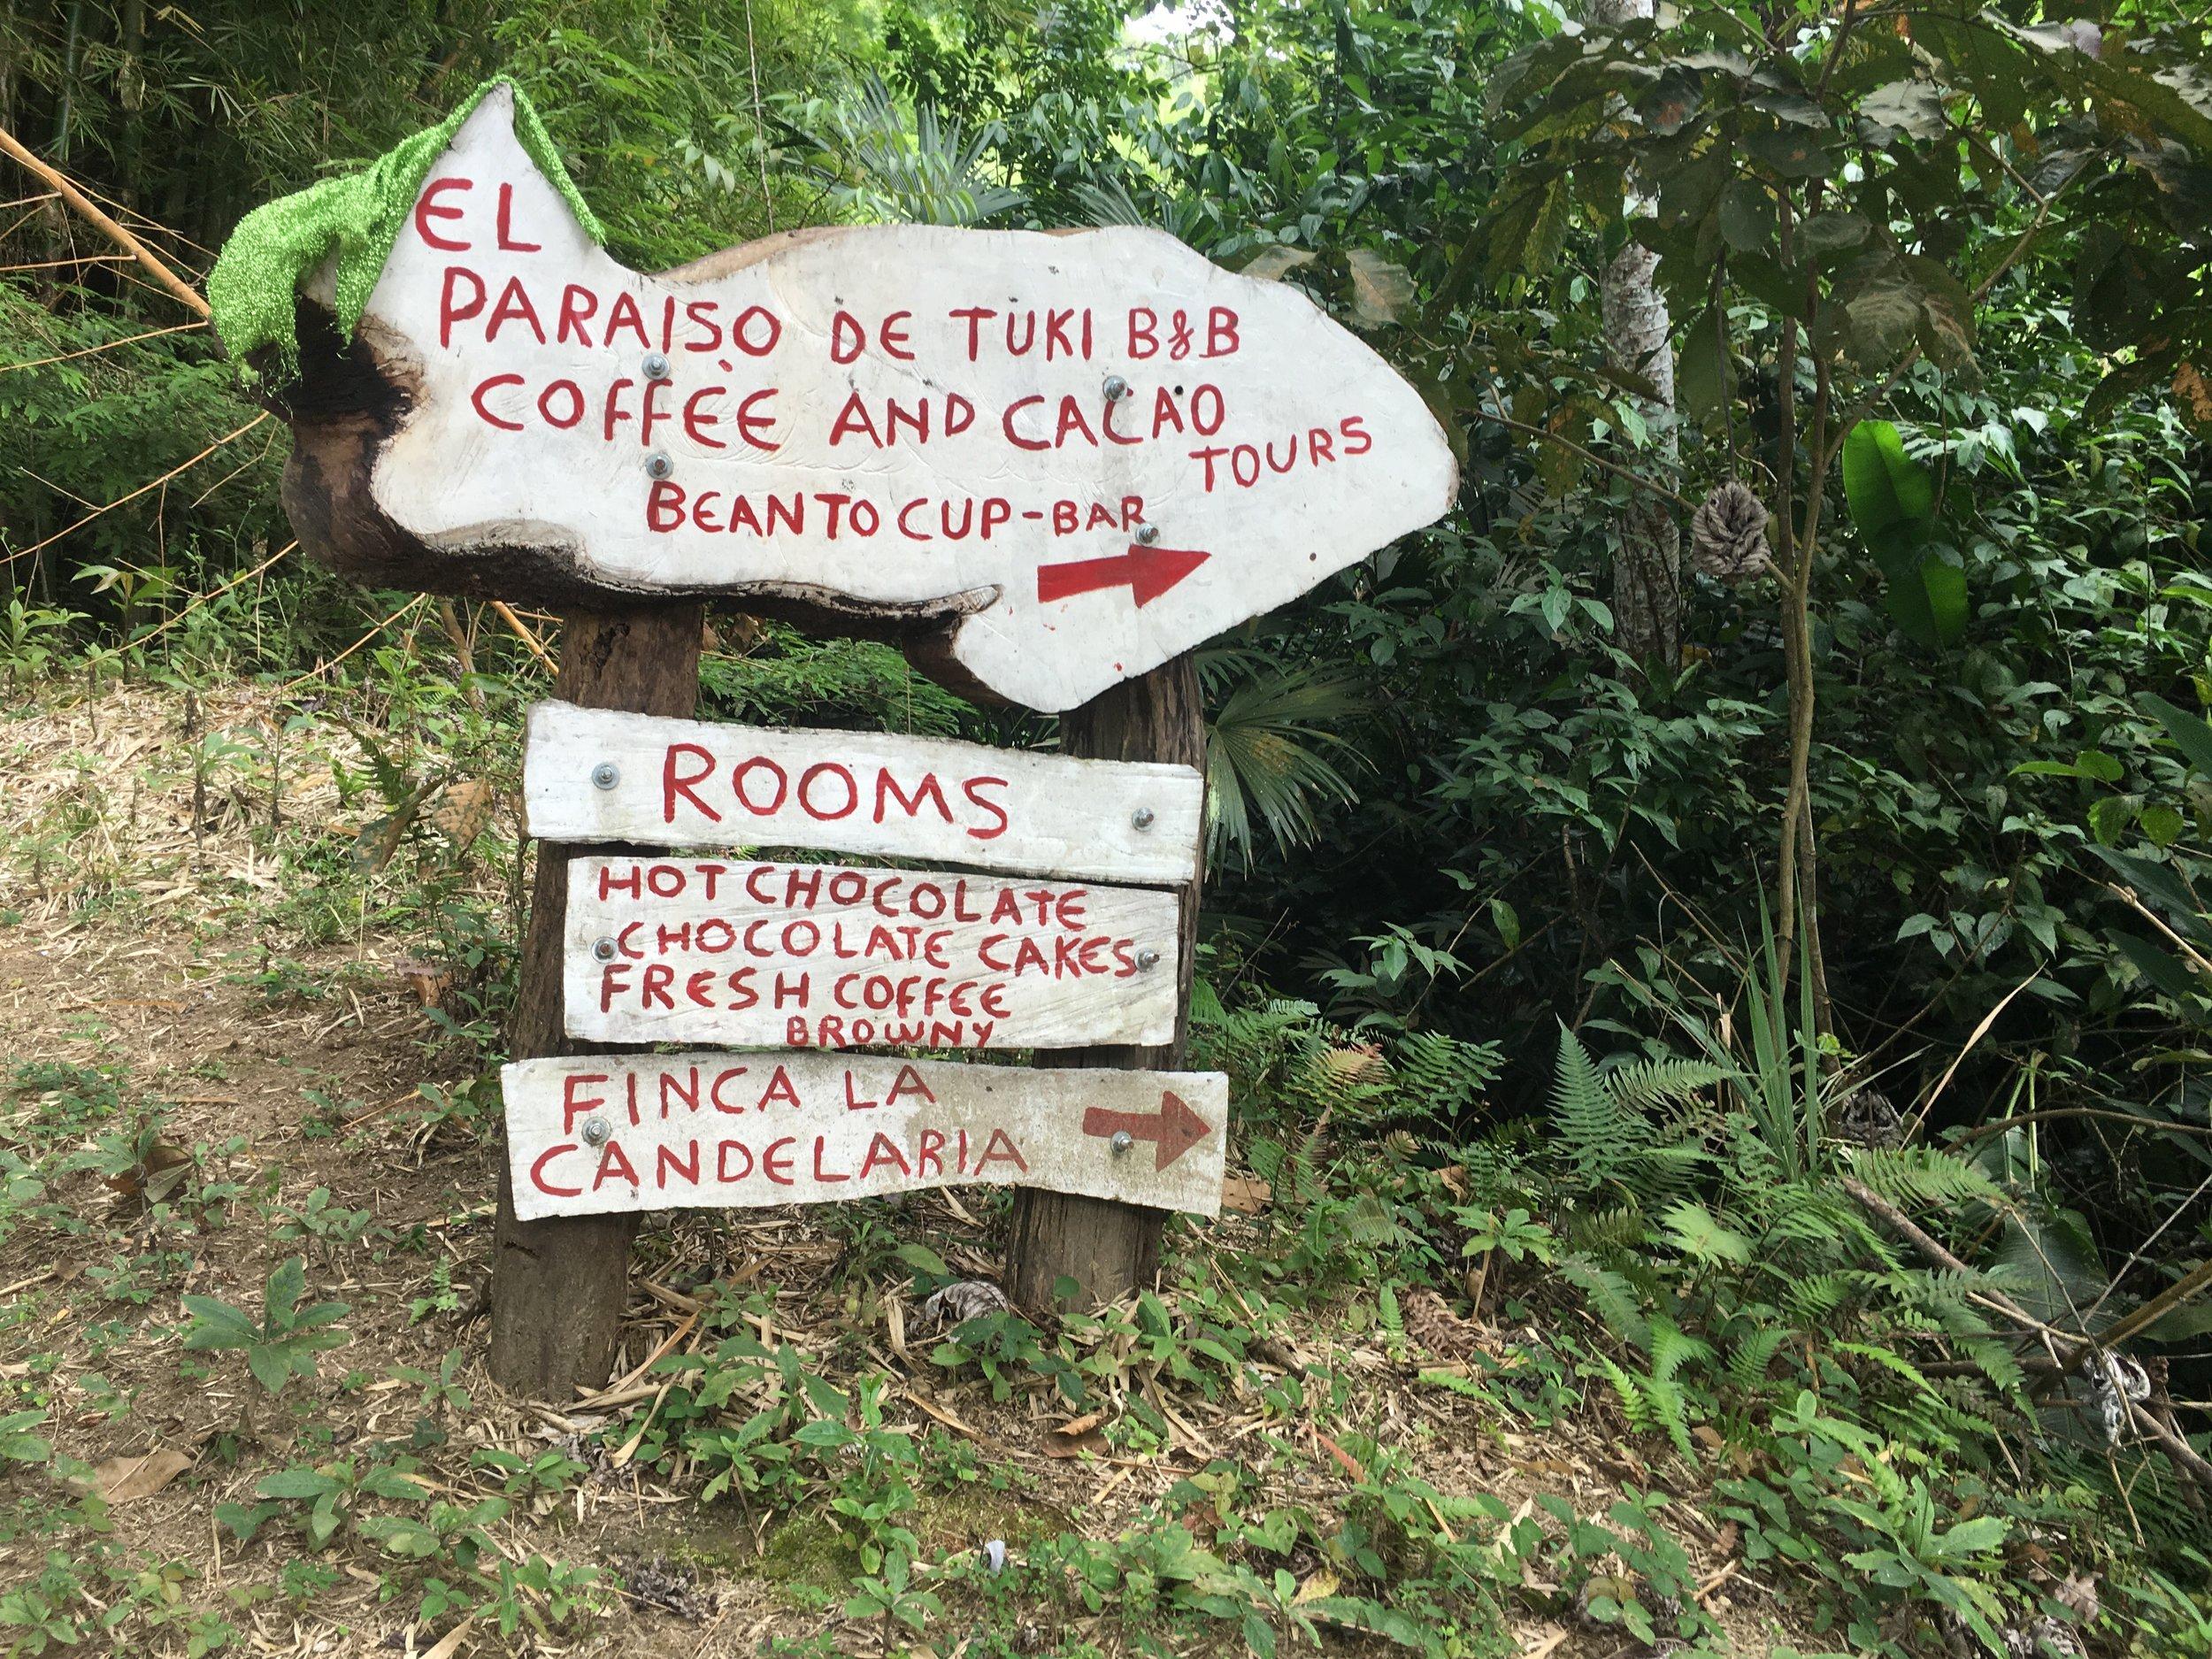 Entrance to El Paraiso de Tuki